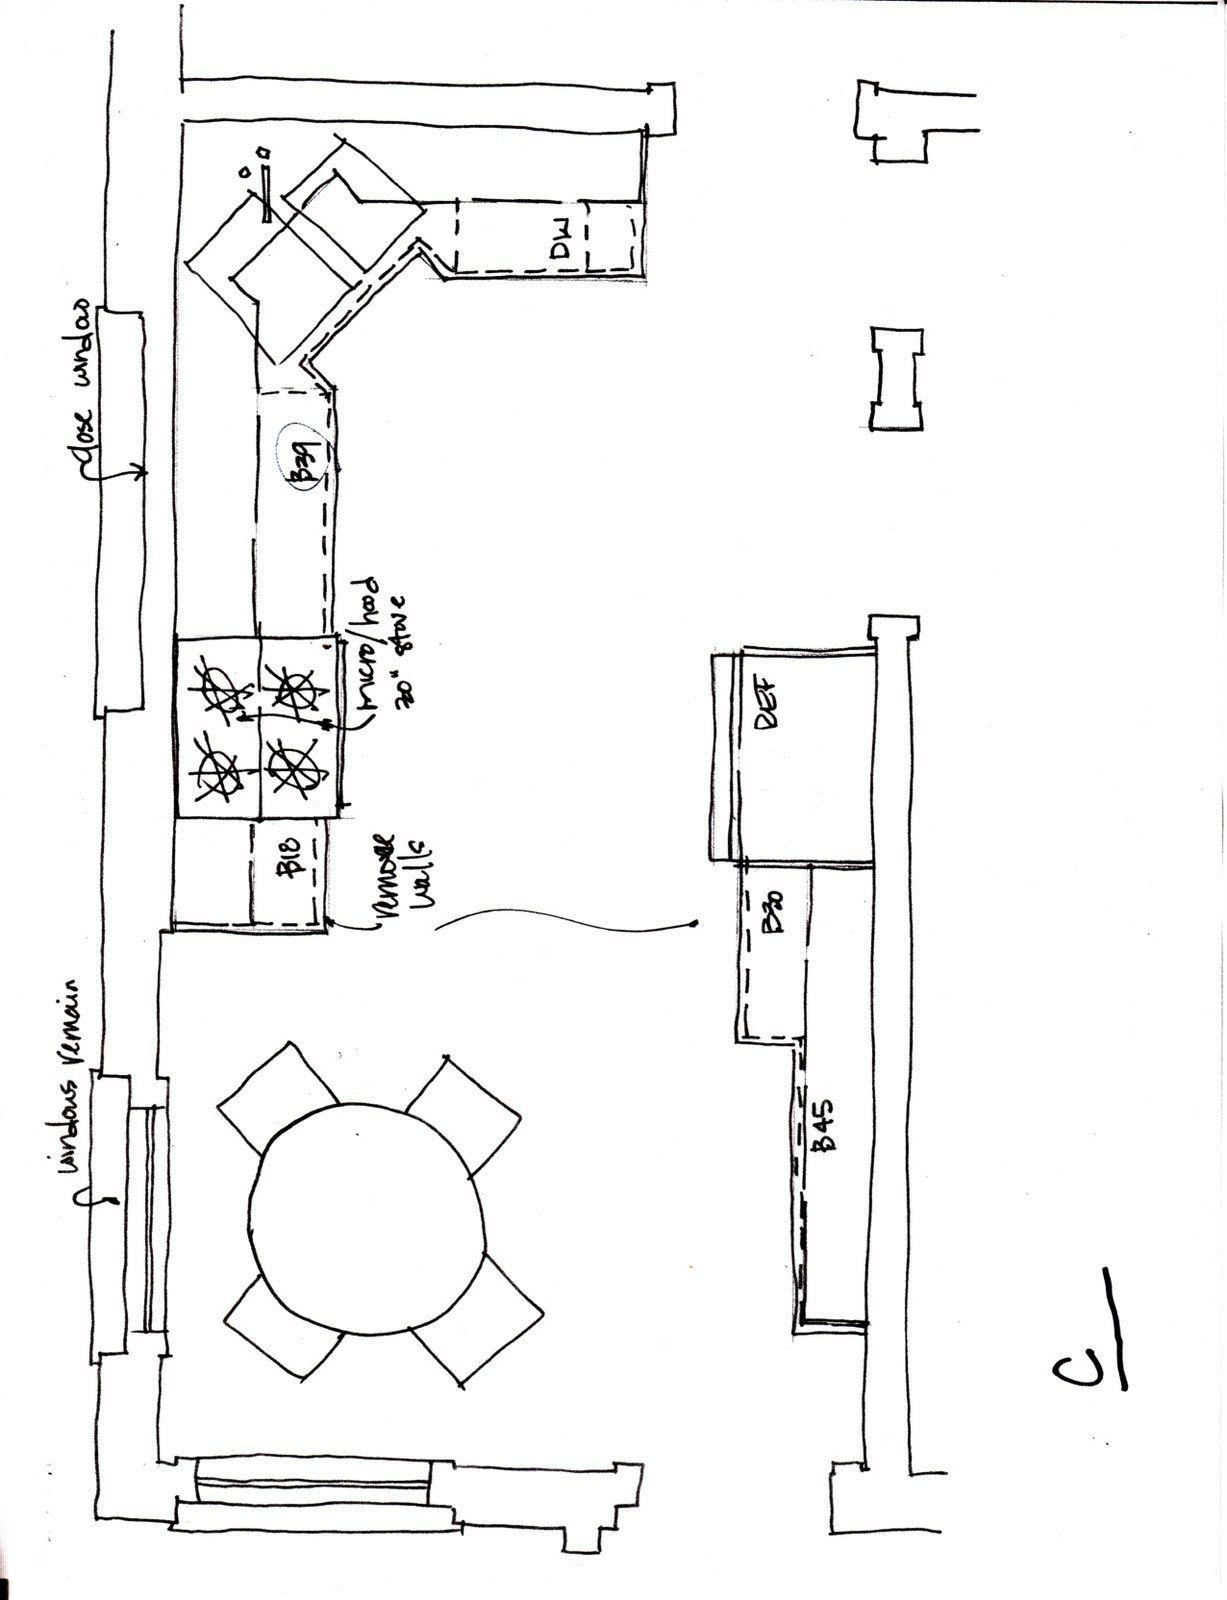 Plans Kitchen Layouts Kitchen Layout Design Kitchen Designs Small Kitchen Design Layout Id Kitchen Floor Plans Small Kitchen Floor Plans Kitchen Cabinet Layout